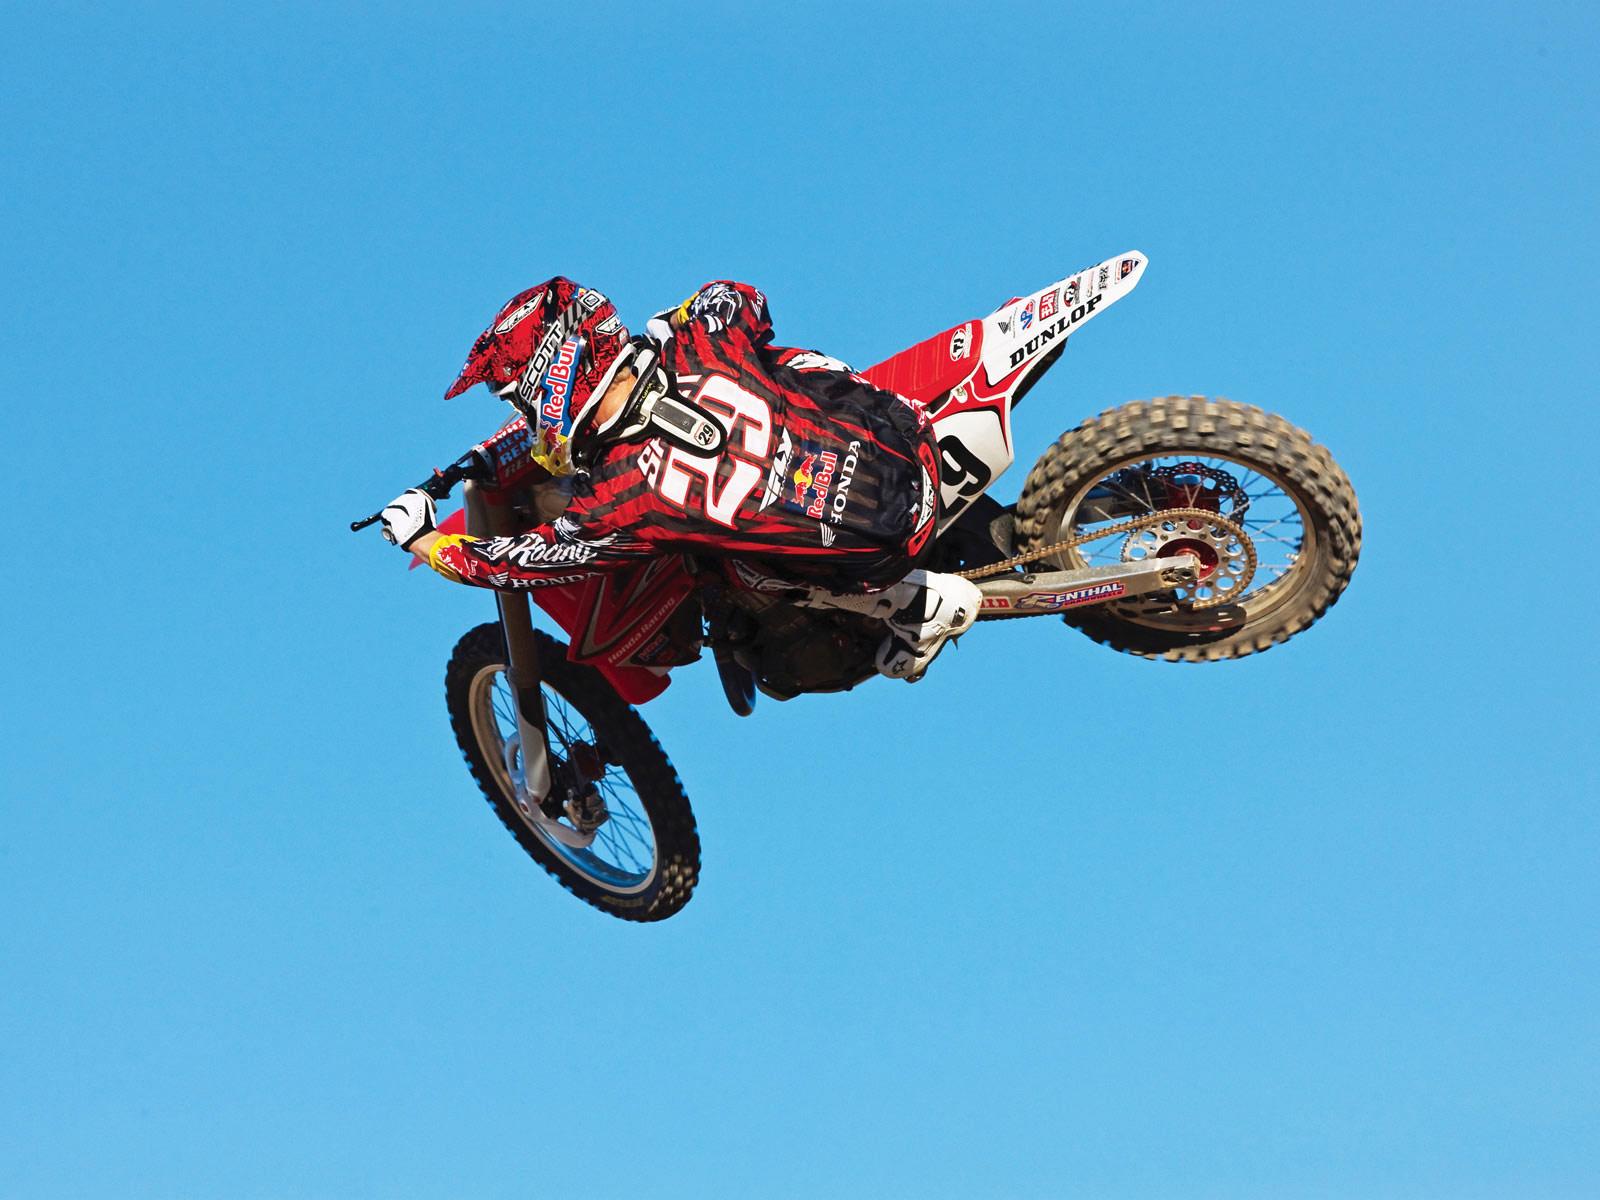 Harley Dealers In Florida >> 2010 Red Bull Racing Andrew Short motorcycle wallpaper